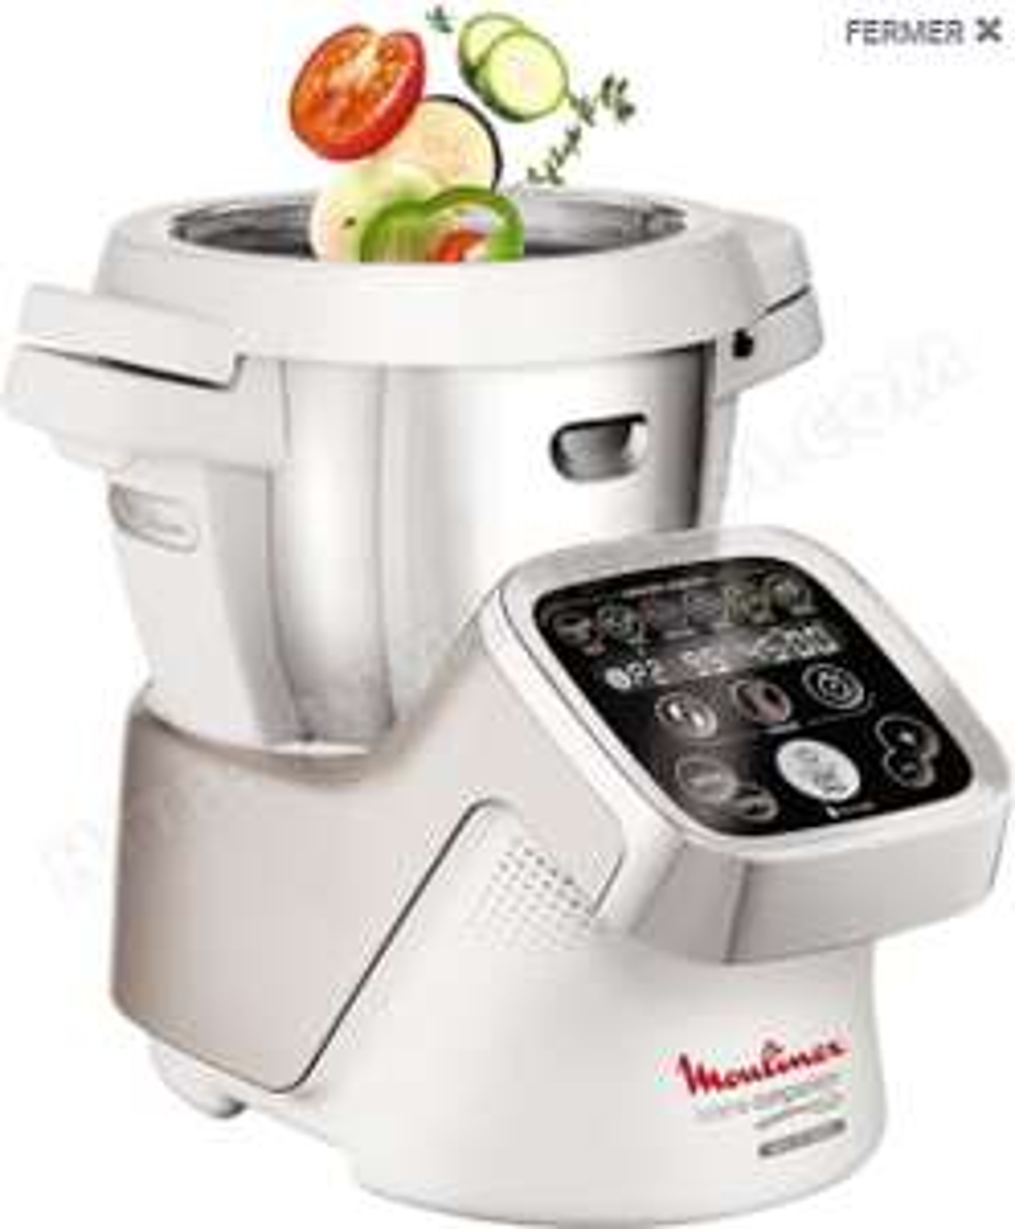 Robot chauffant multifonction moulinex Companion HF800 A12 - Blanc